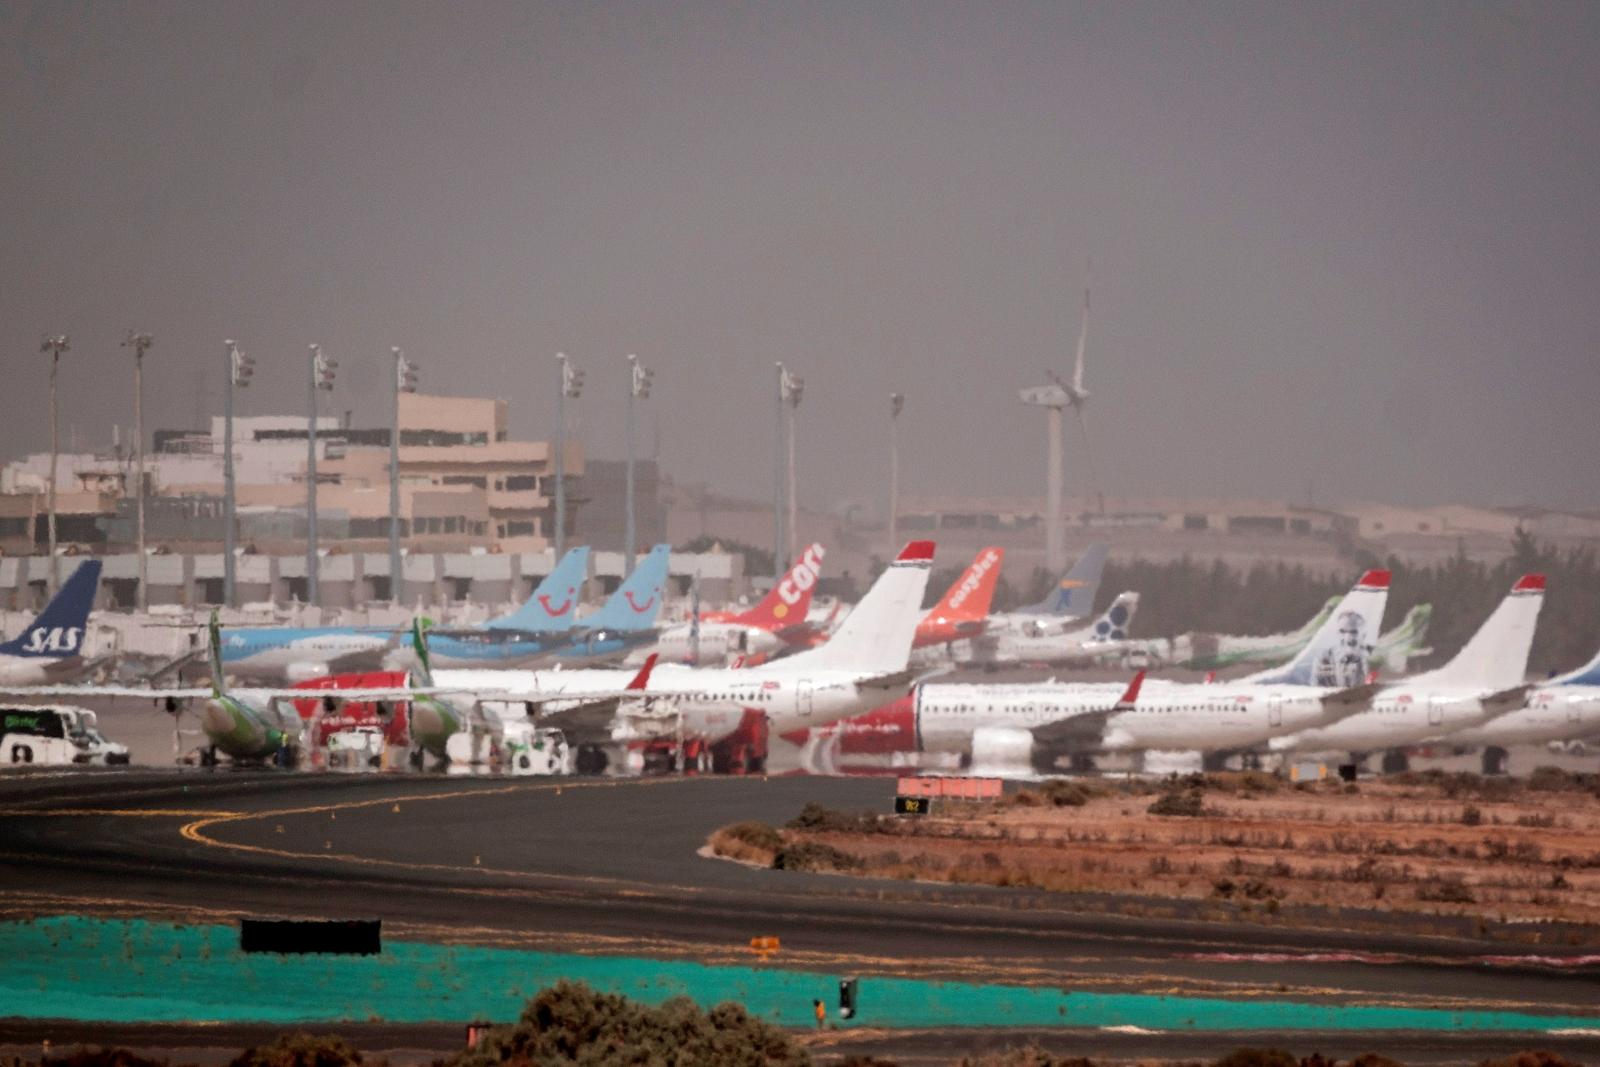 Samoloty fot. EPA/Angel Medina G.